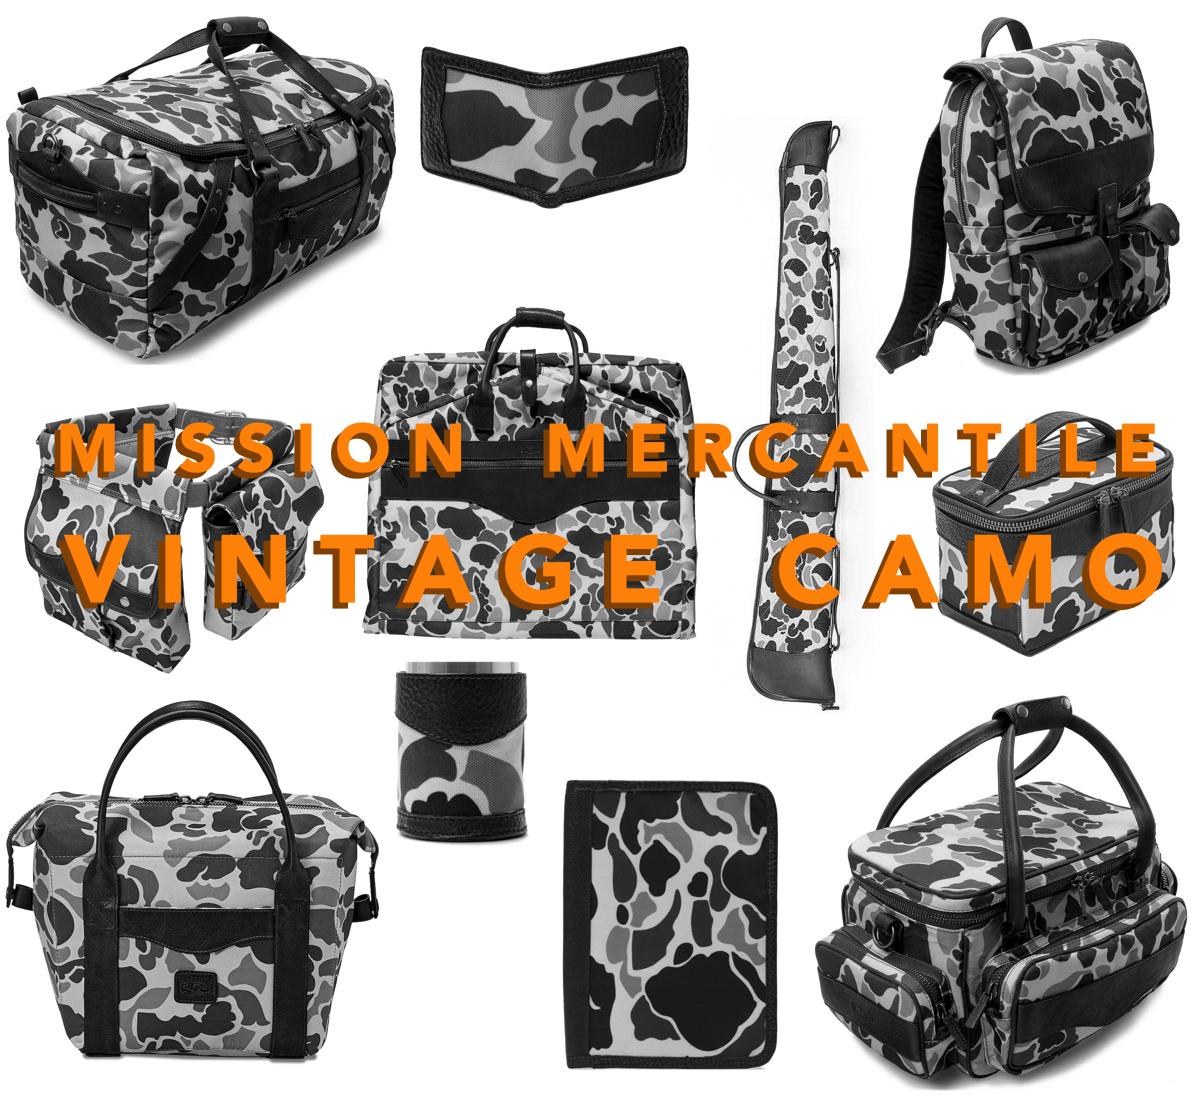 Mission Mercantile – Vintage Camo Has Arrived!